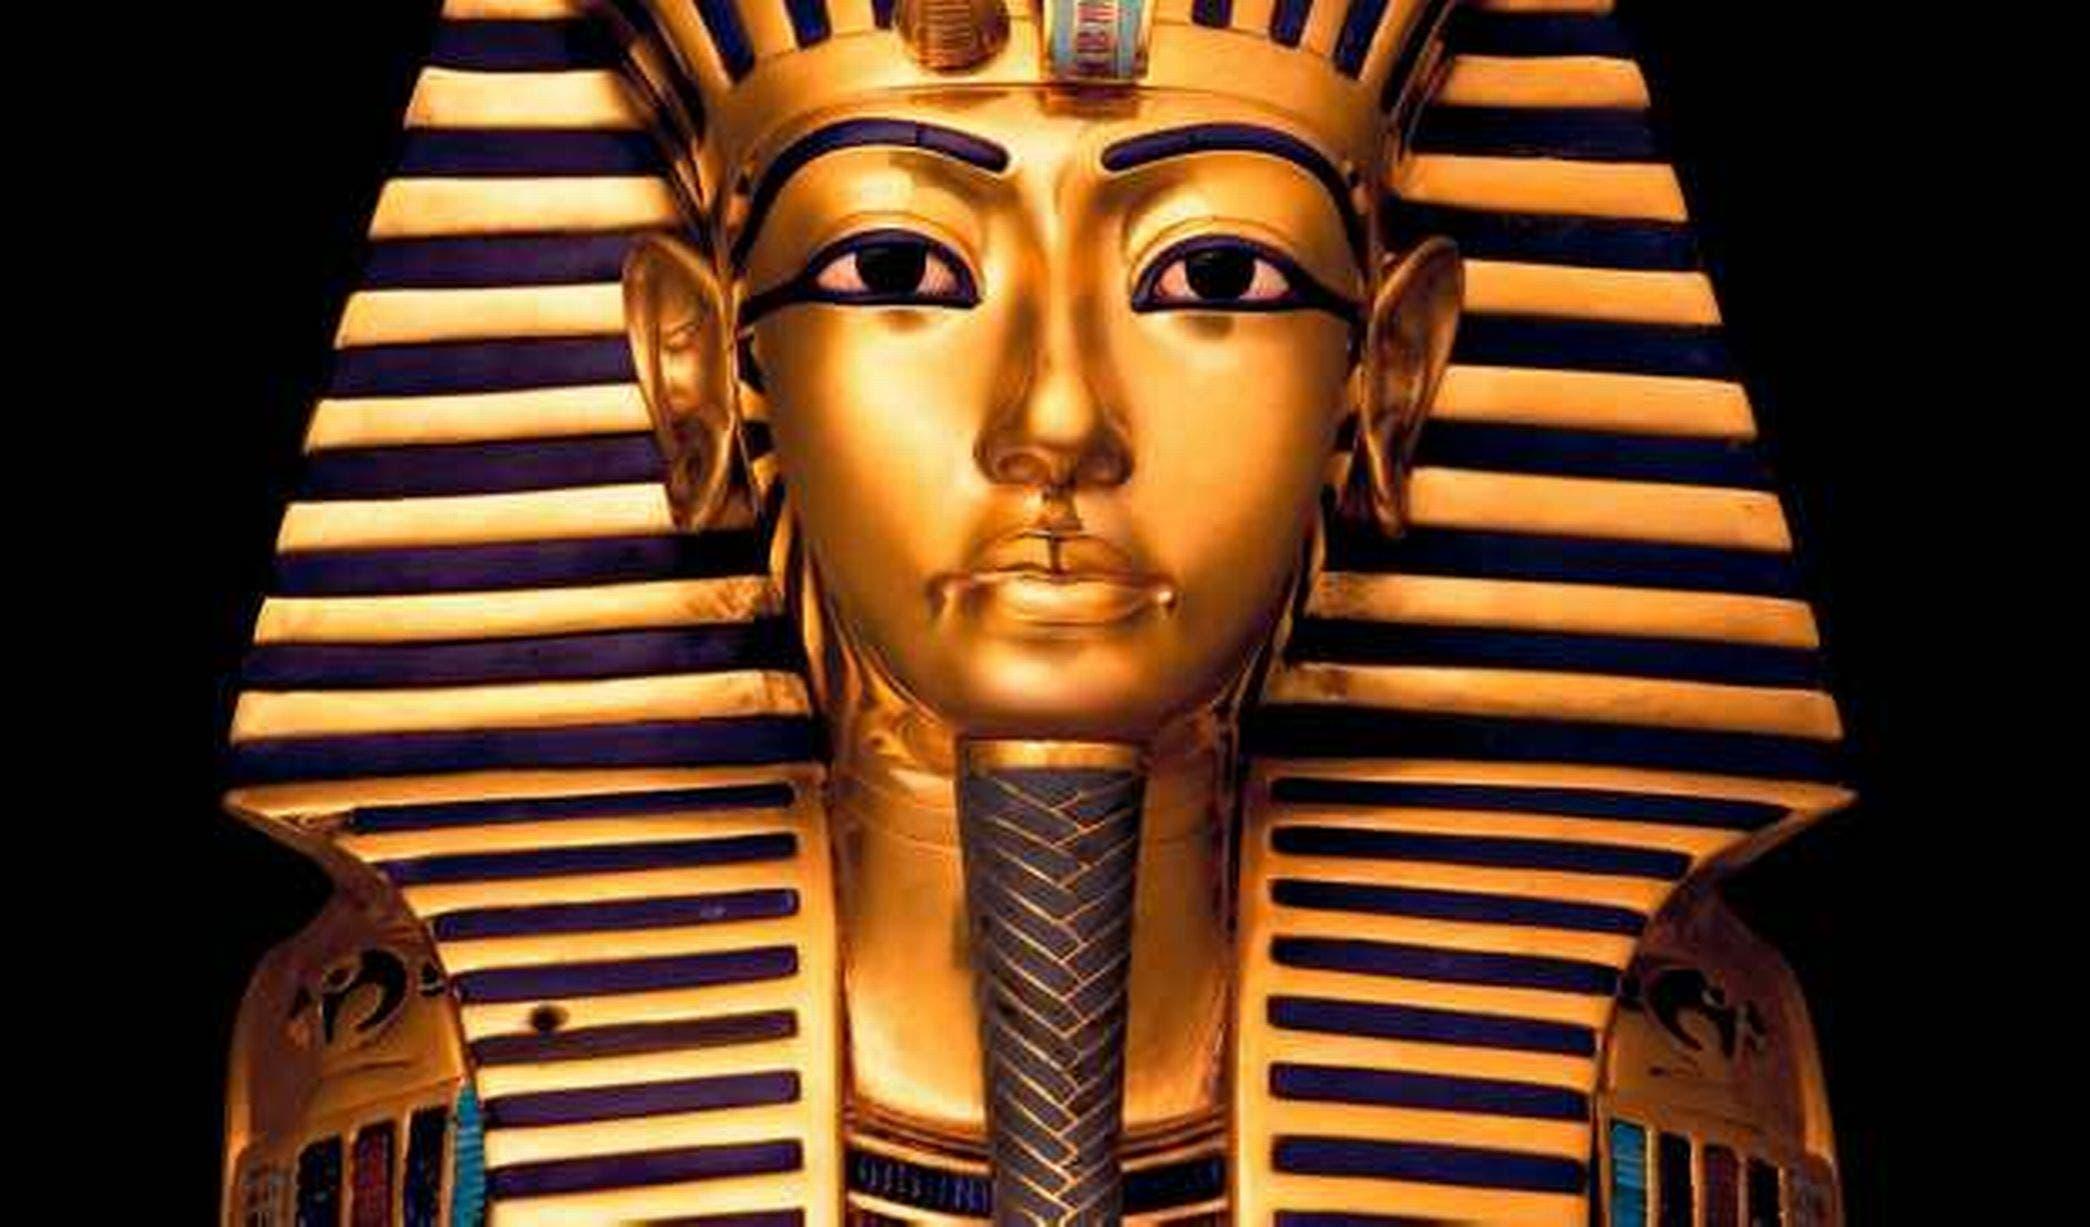 tut tut tut archeologists clash over tutankhamun secret. Black Bedroom Furniture Sets. Home Design Ideas